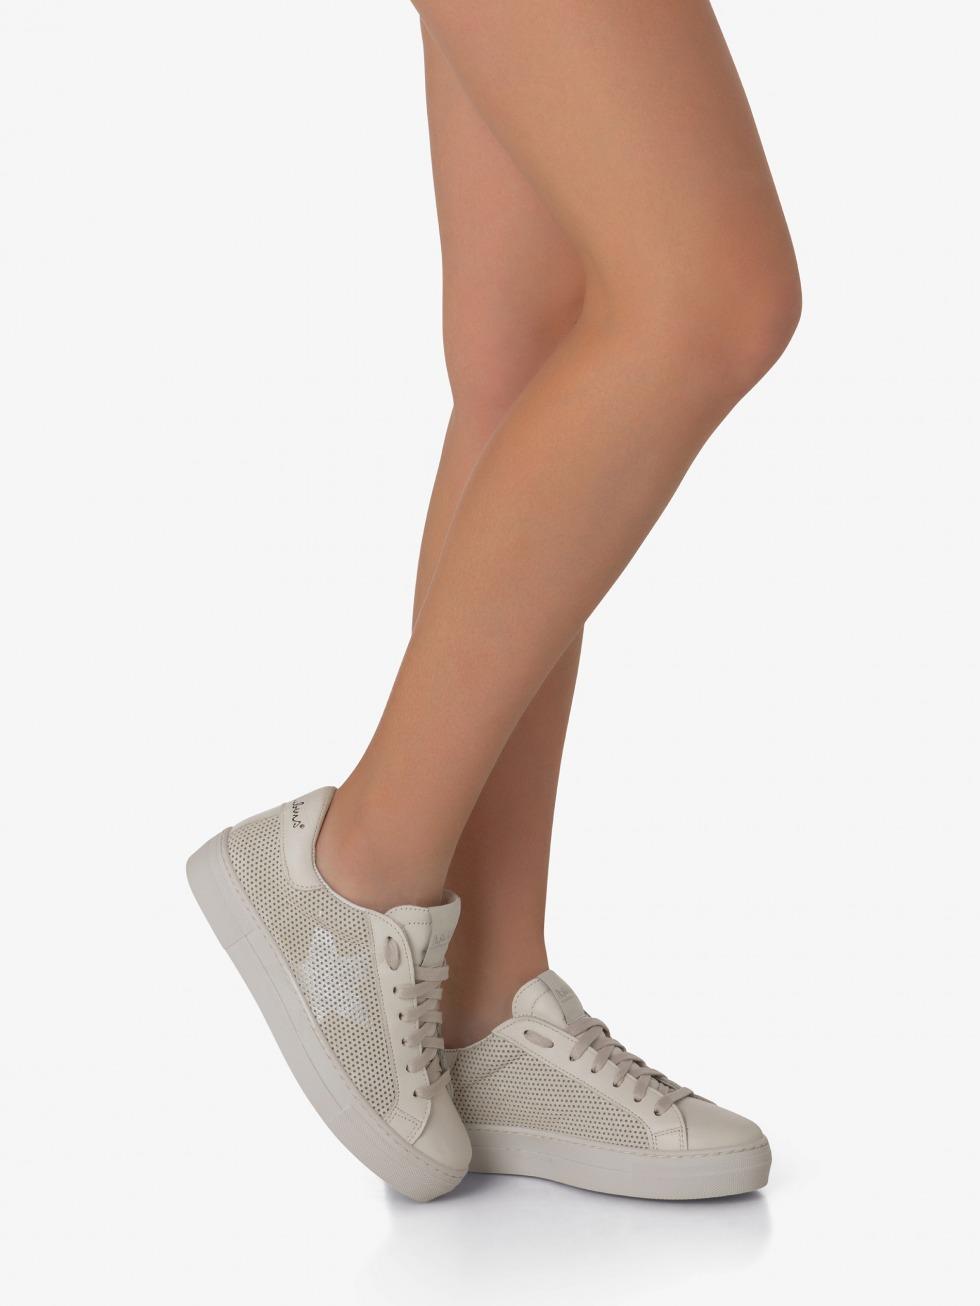 Martini Sneakers - Golf Star